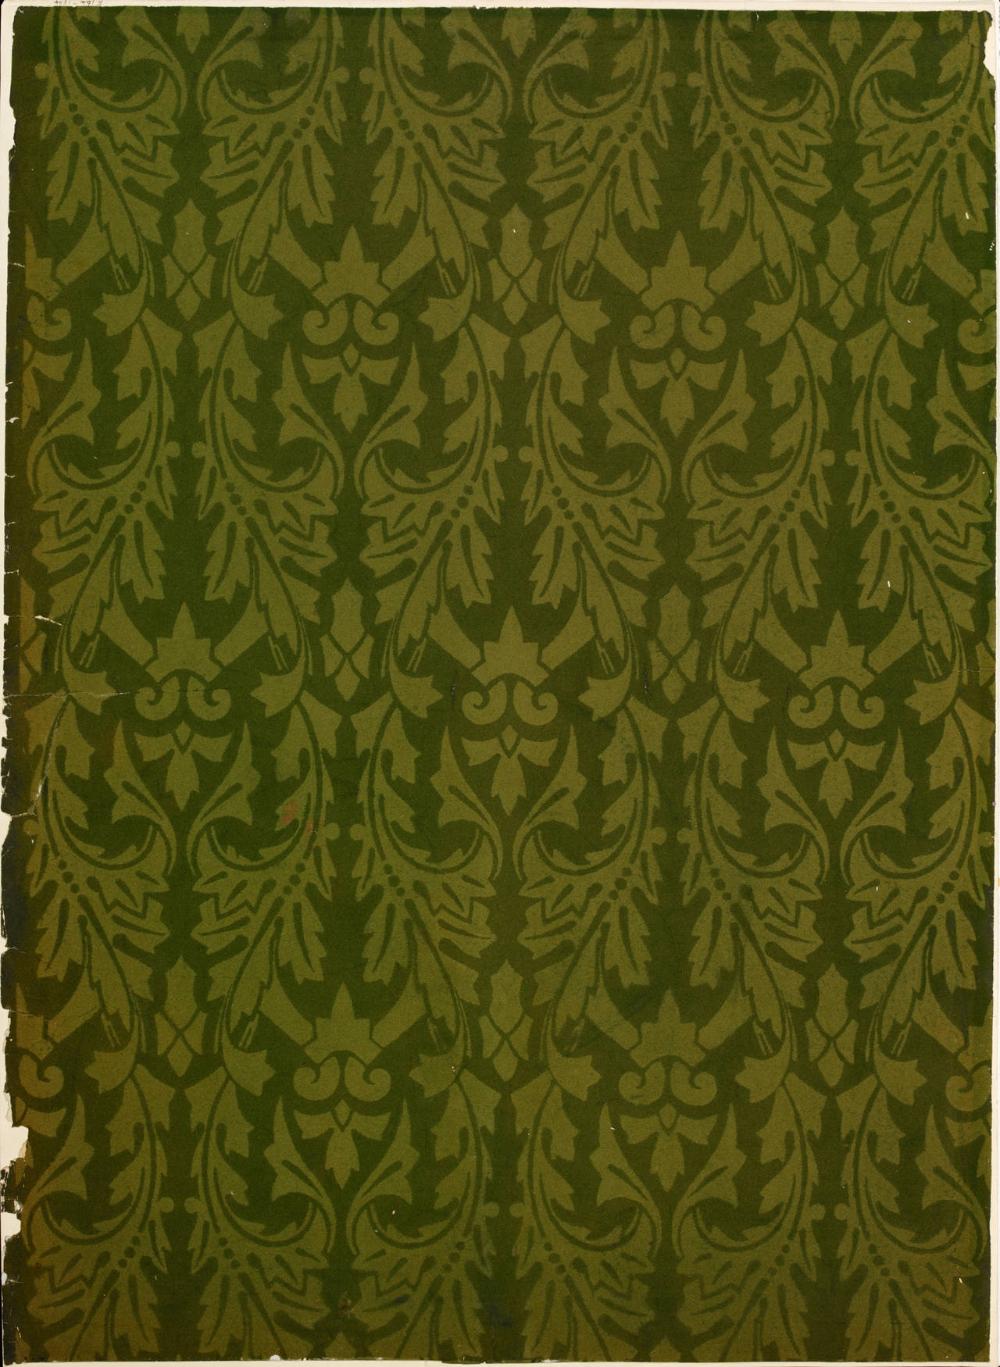 V&A · Flock wallpaper in 2020 Flock wallpaper, Wallpaper